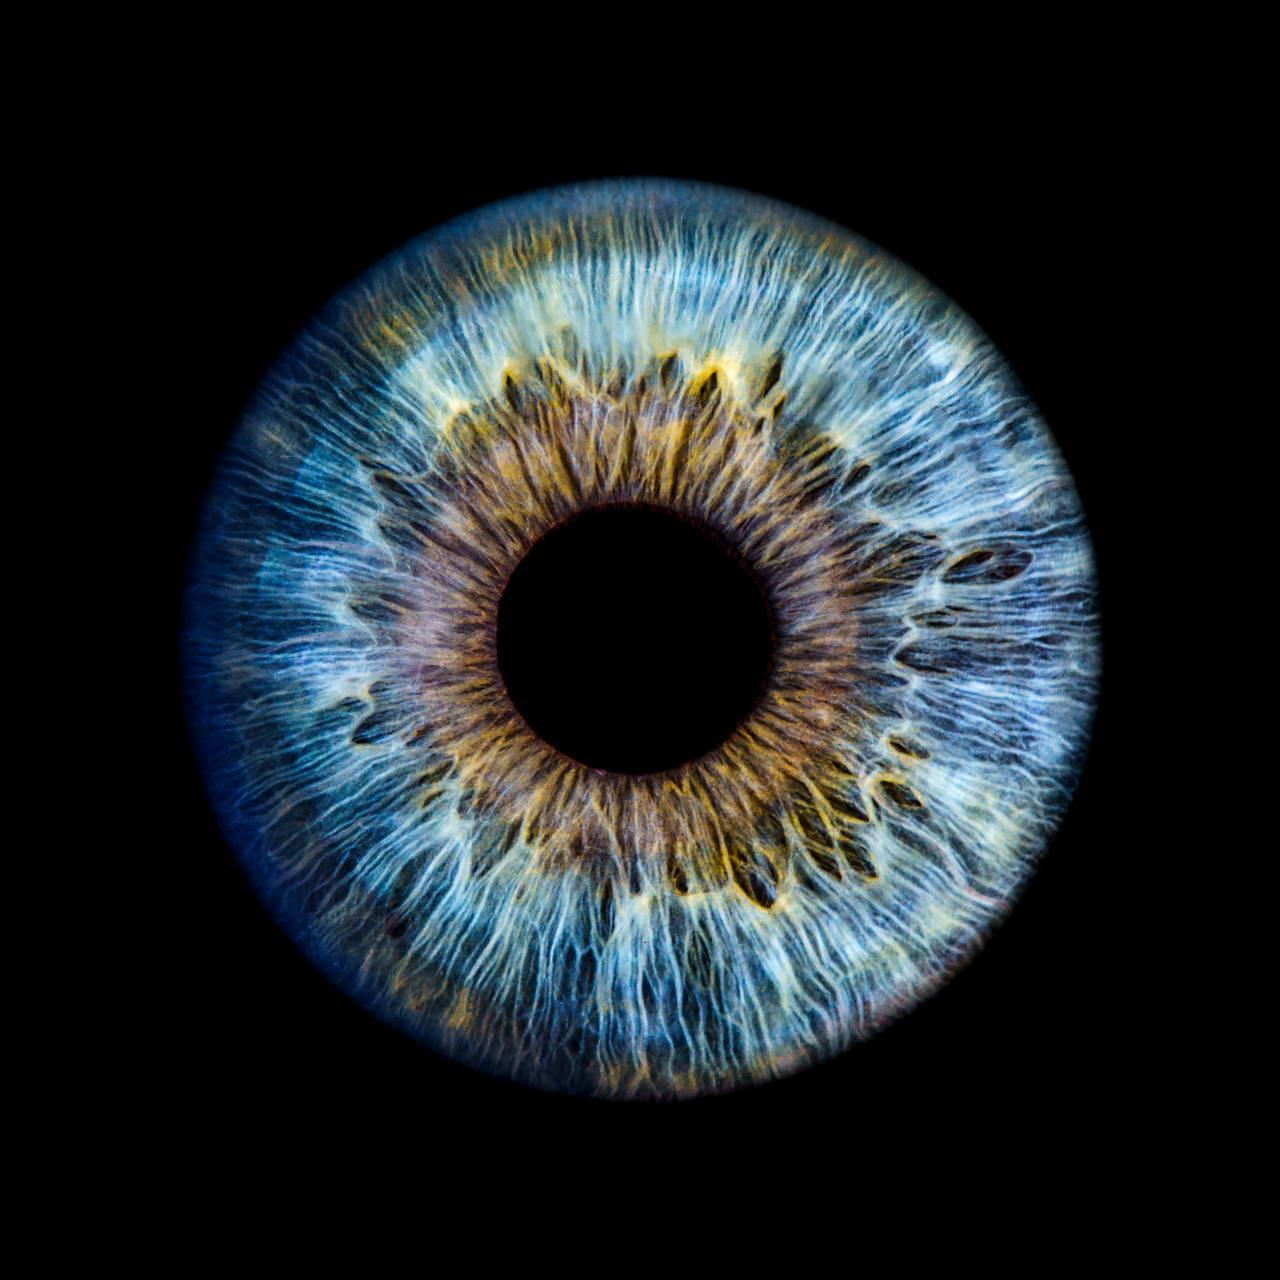 Iris dunkler die ring um Irisdiagnose für